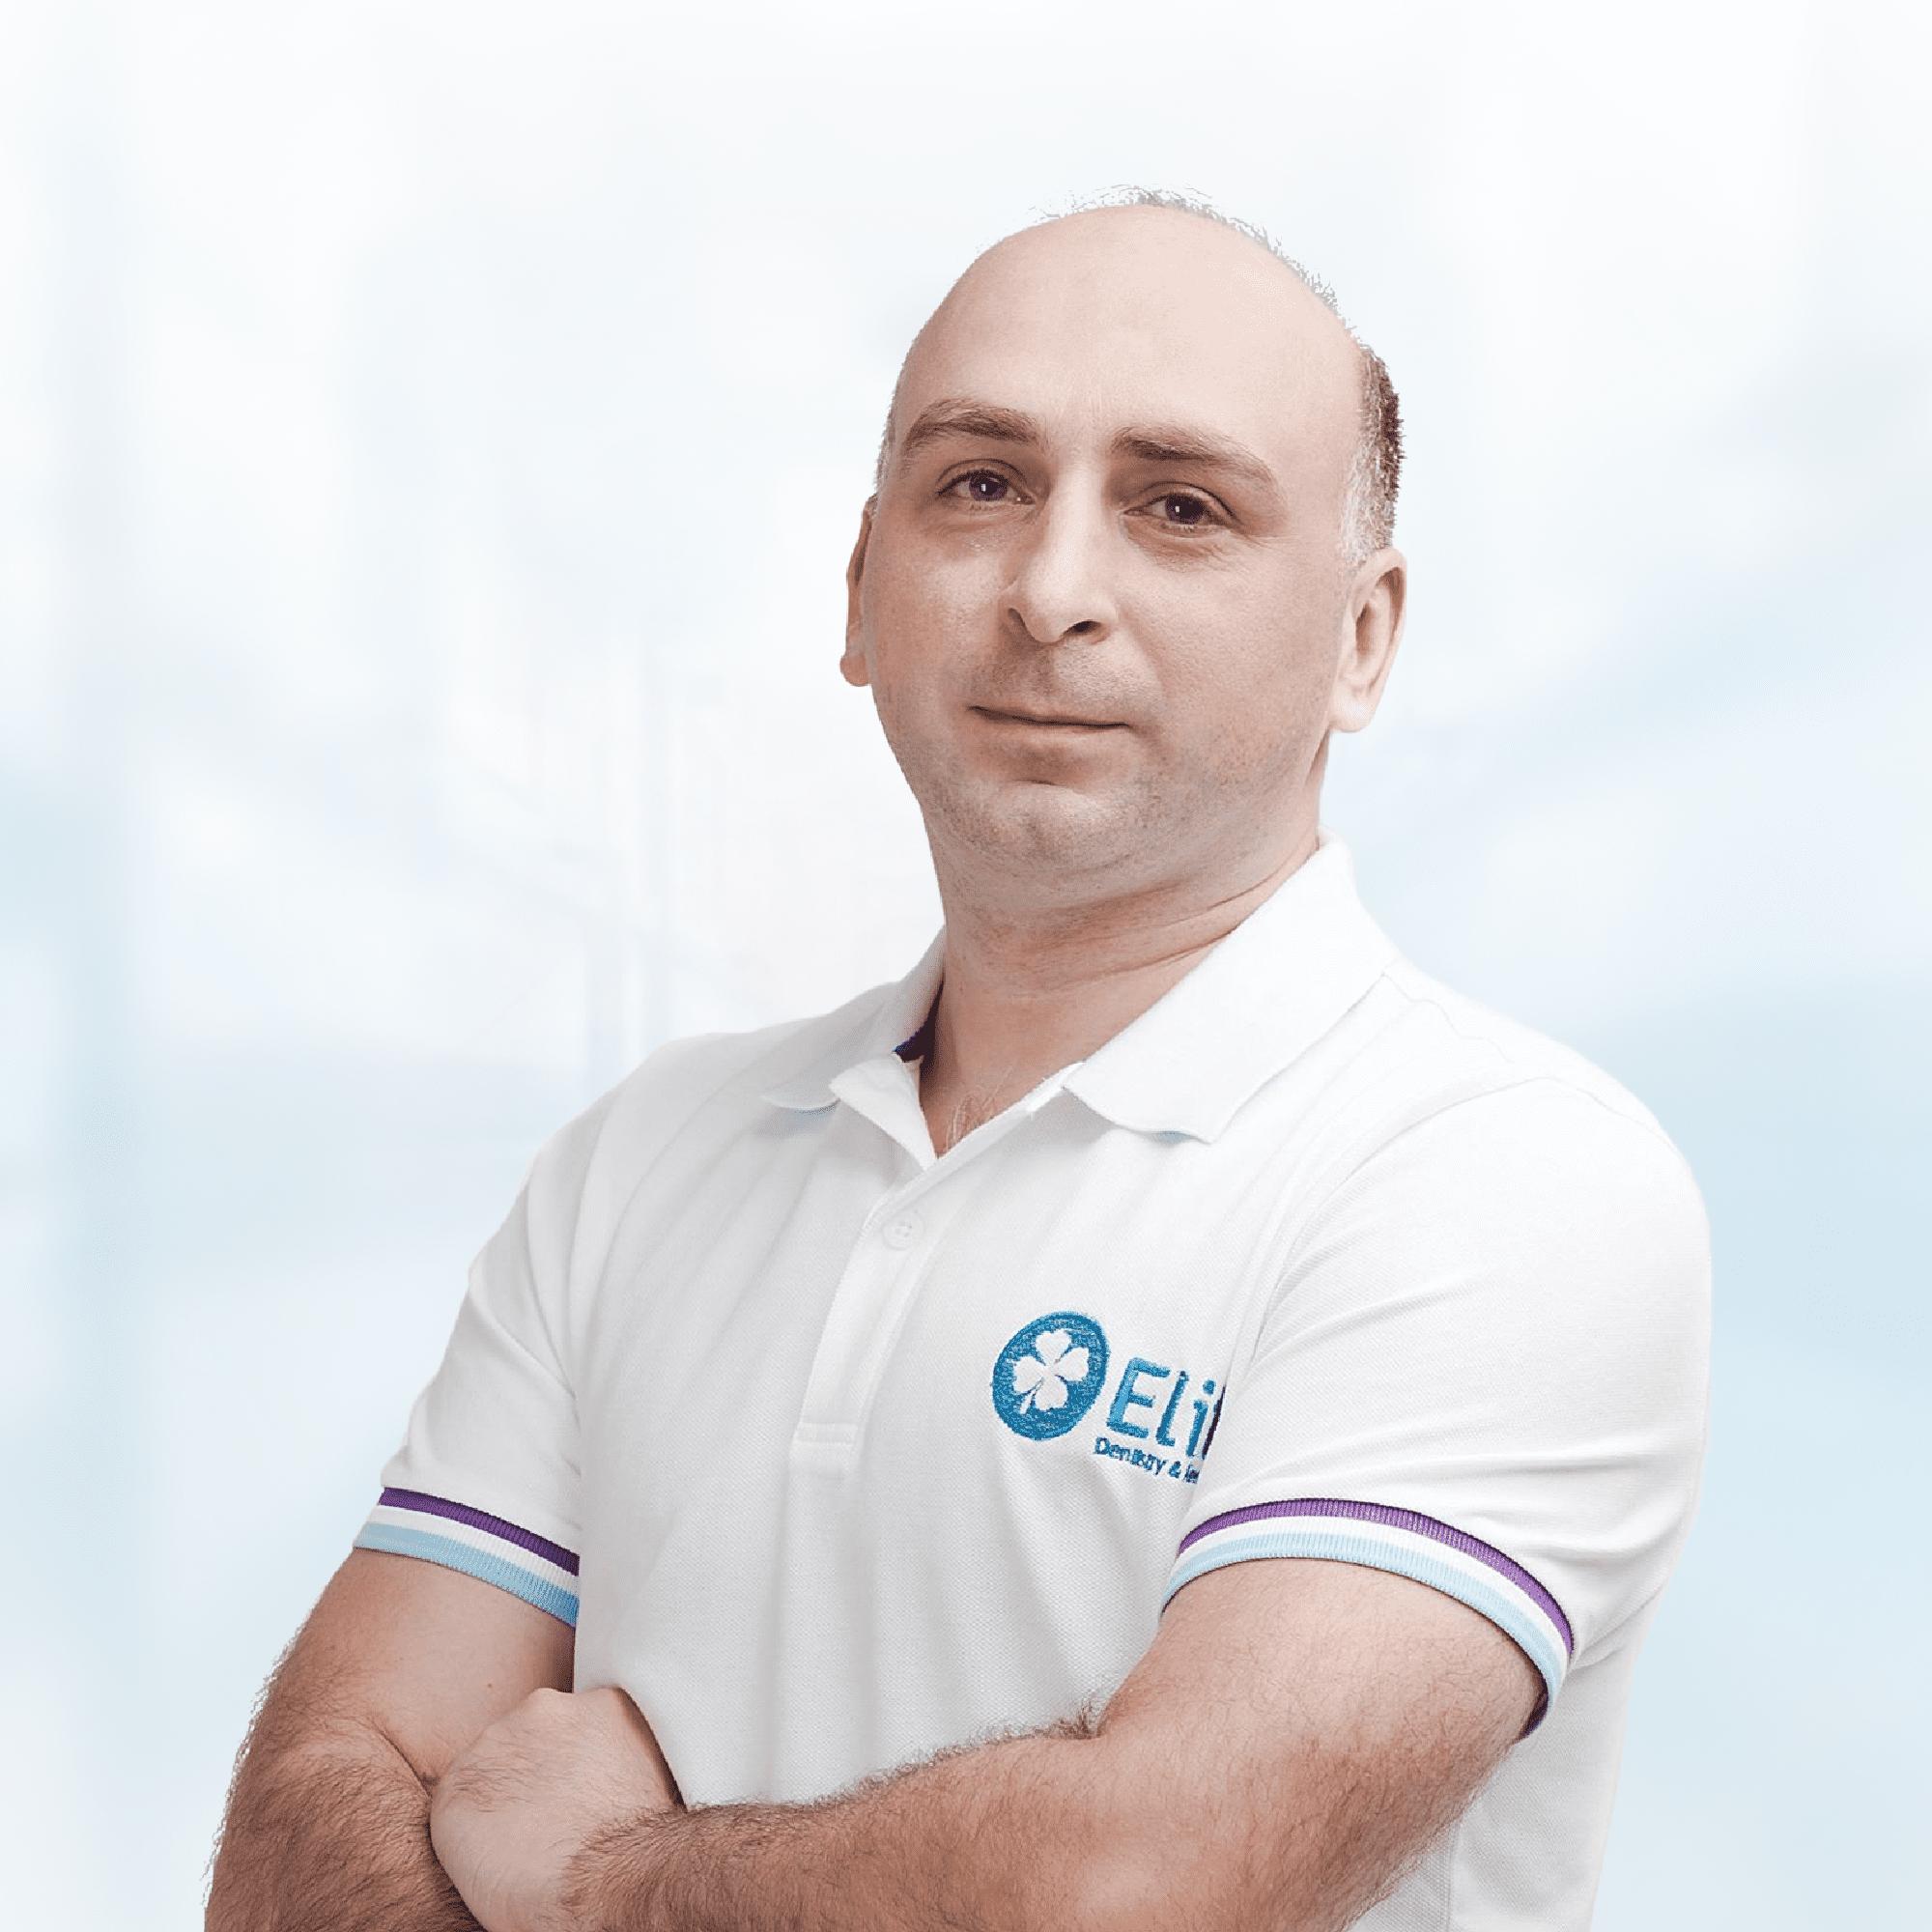 https://elitedent.co.il/wp-content/uploads/2021/04/03_Леван-Кобачишвили.png